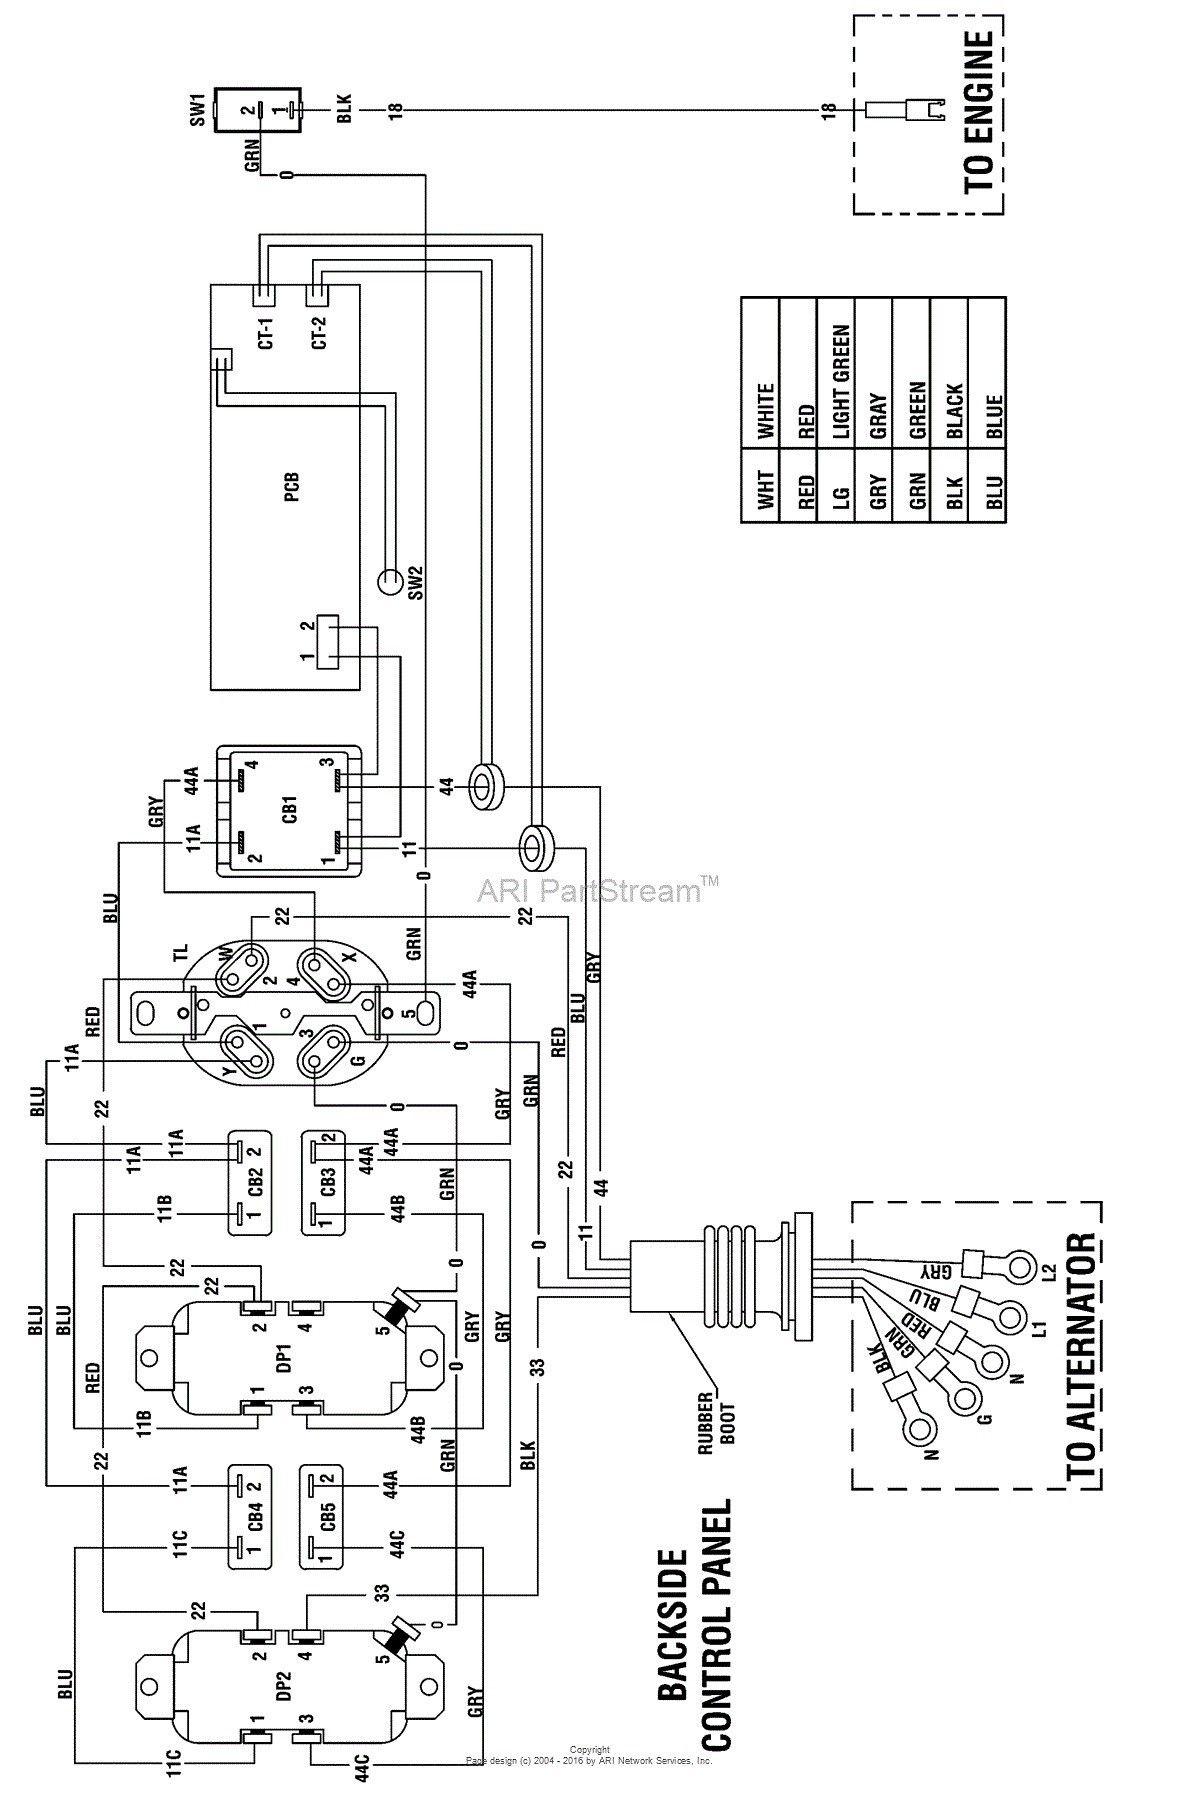 Briggs And Stratton V Twin Wiring Diagram : briggs, stratton, wiring, diagram, Briggs, Stratton, Wiring, Diagram, Stratton,, Diagram,, Electrical